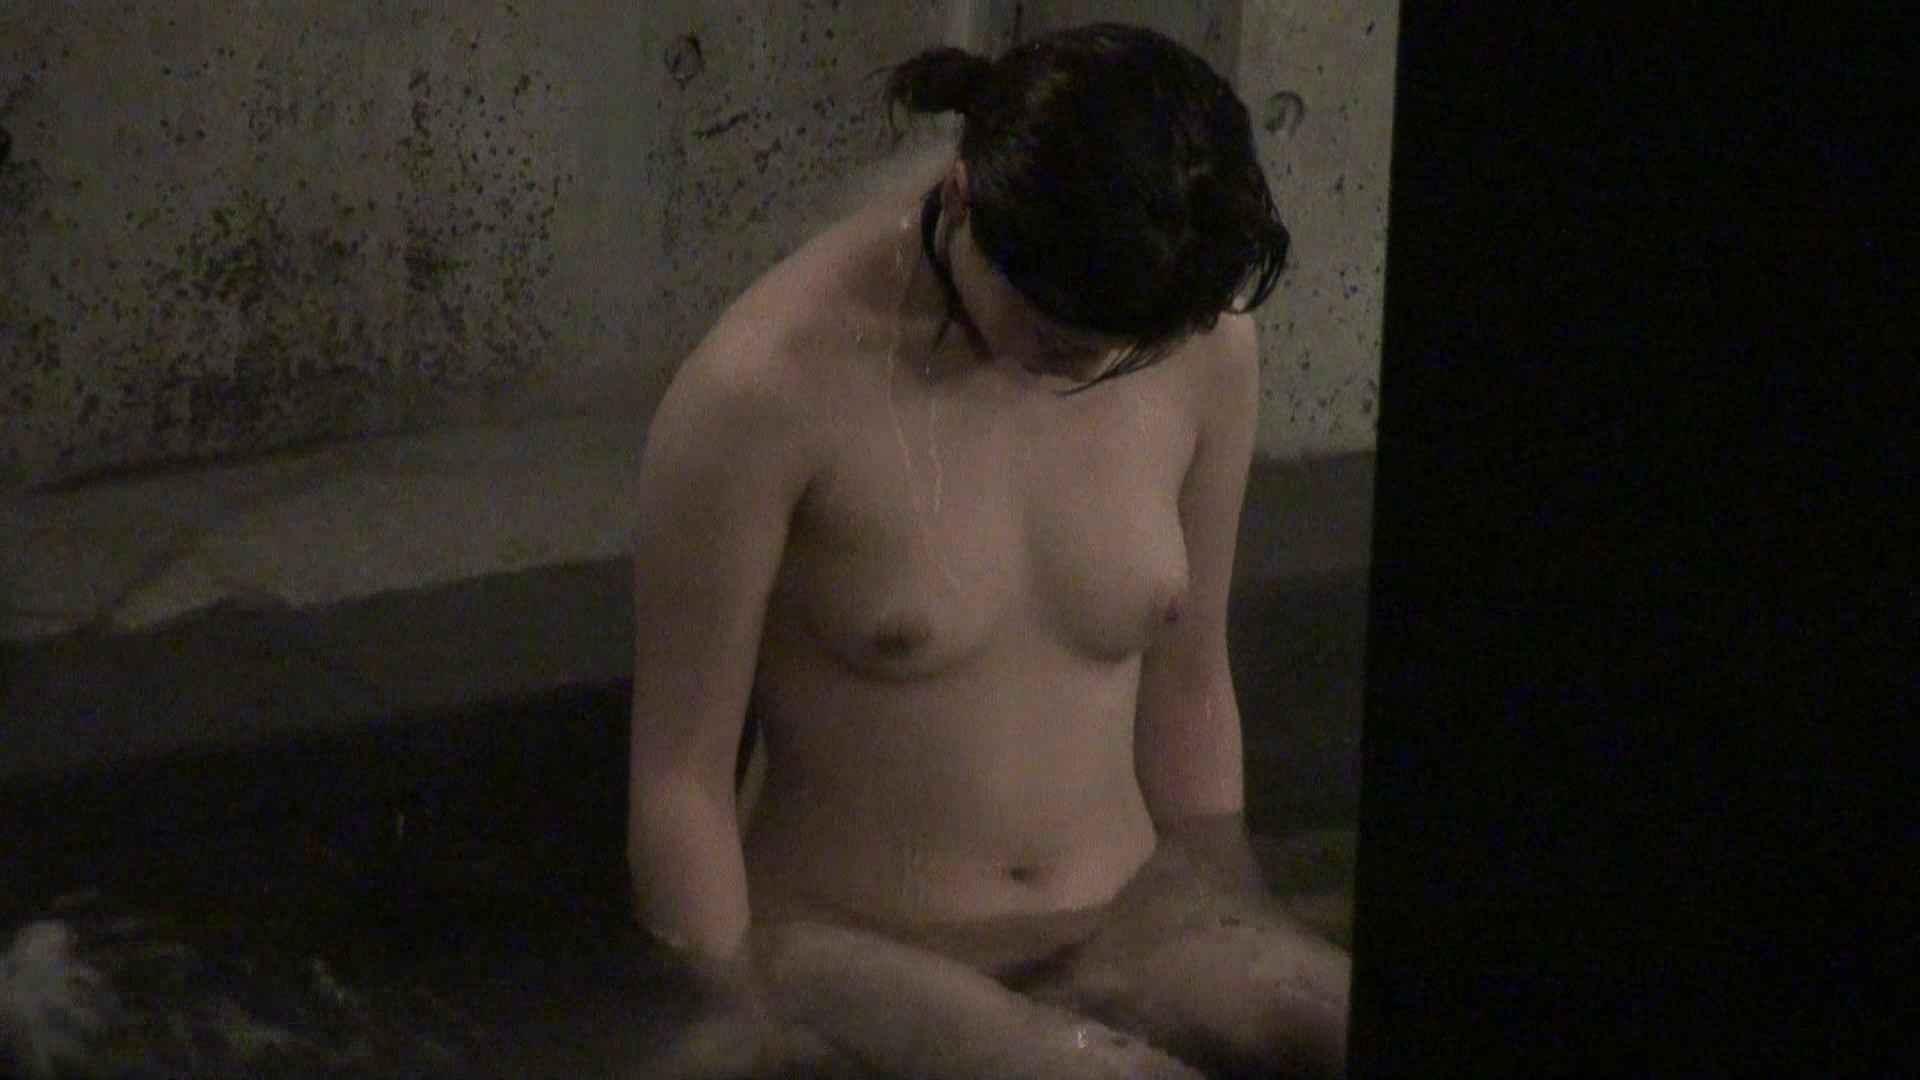 Aquaな露天風呂Vol.393 綺麗なOLたち  91枚 78